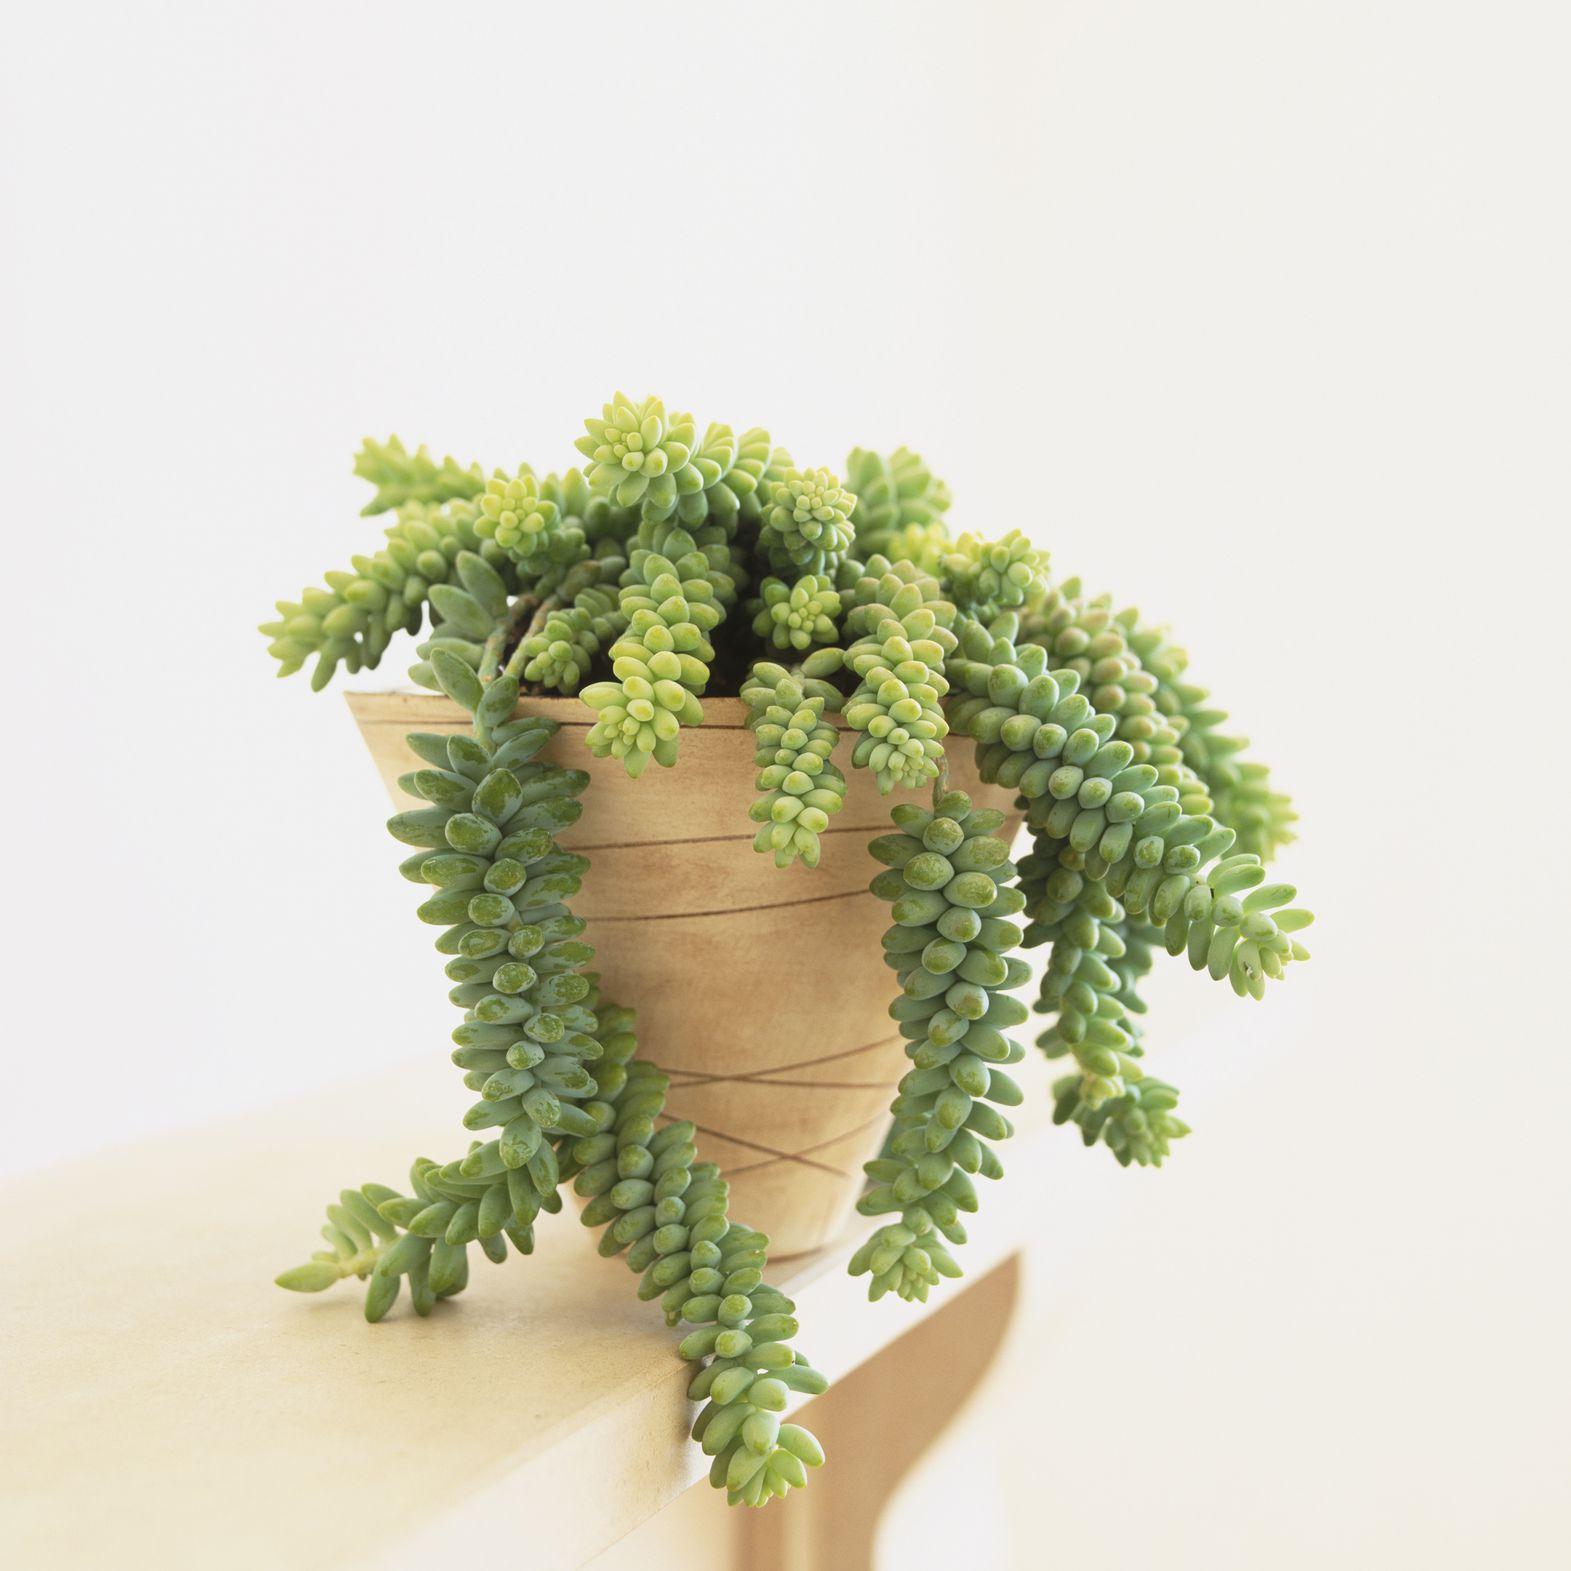 Sedum Morganianum (Burro's Tail)